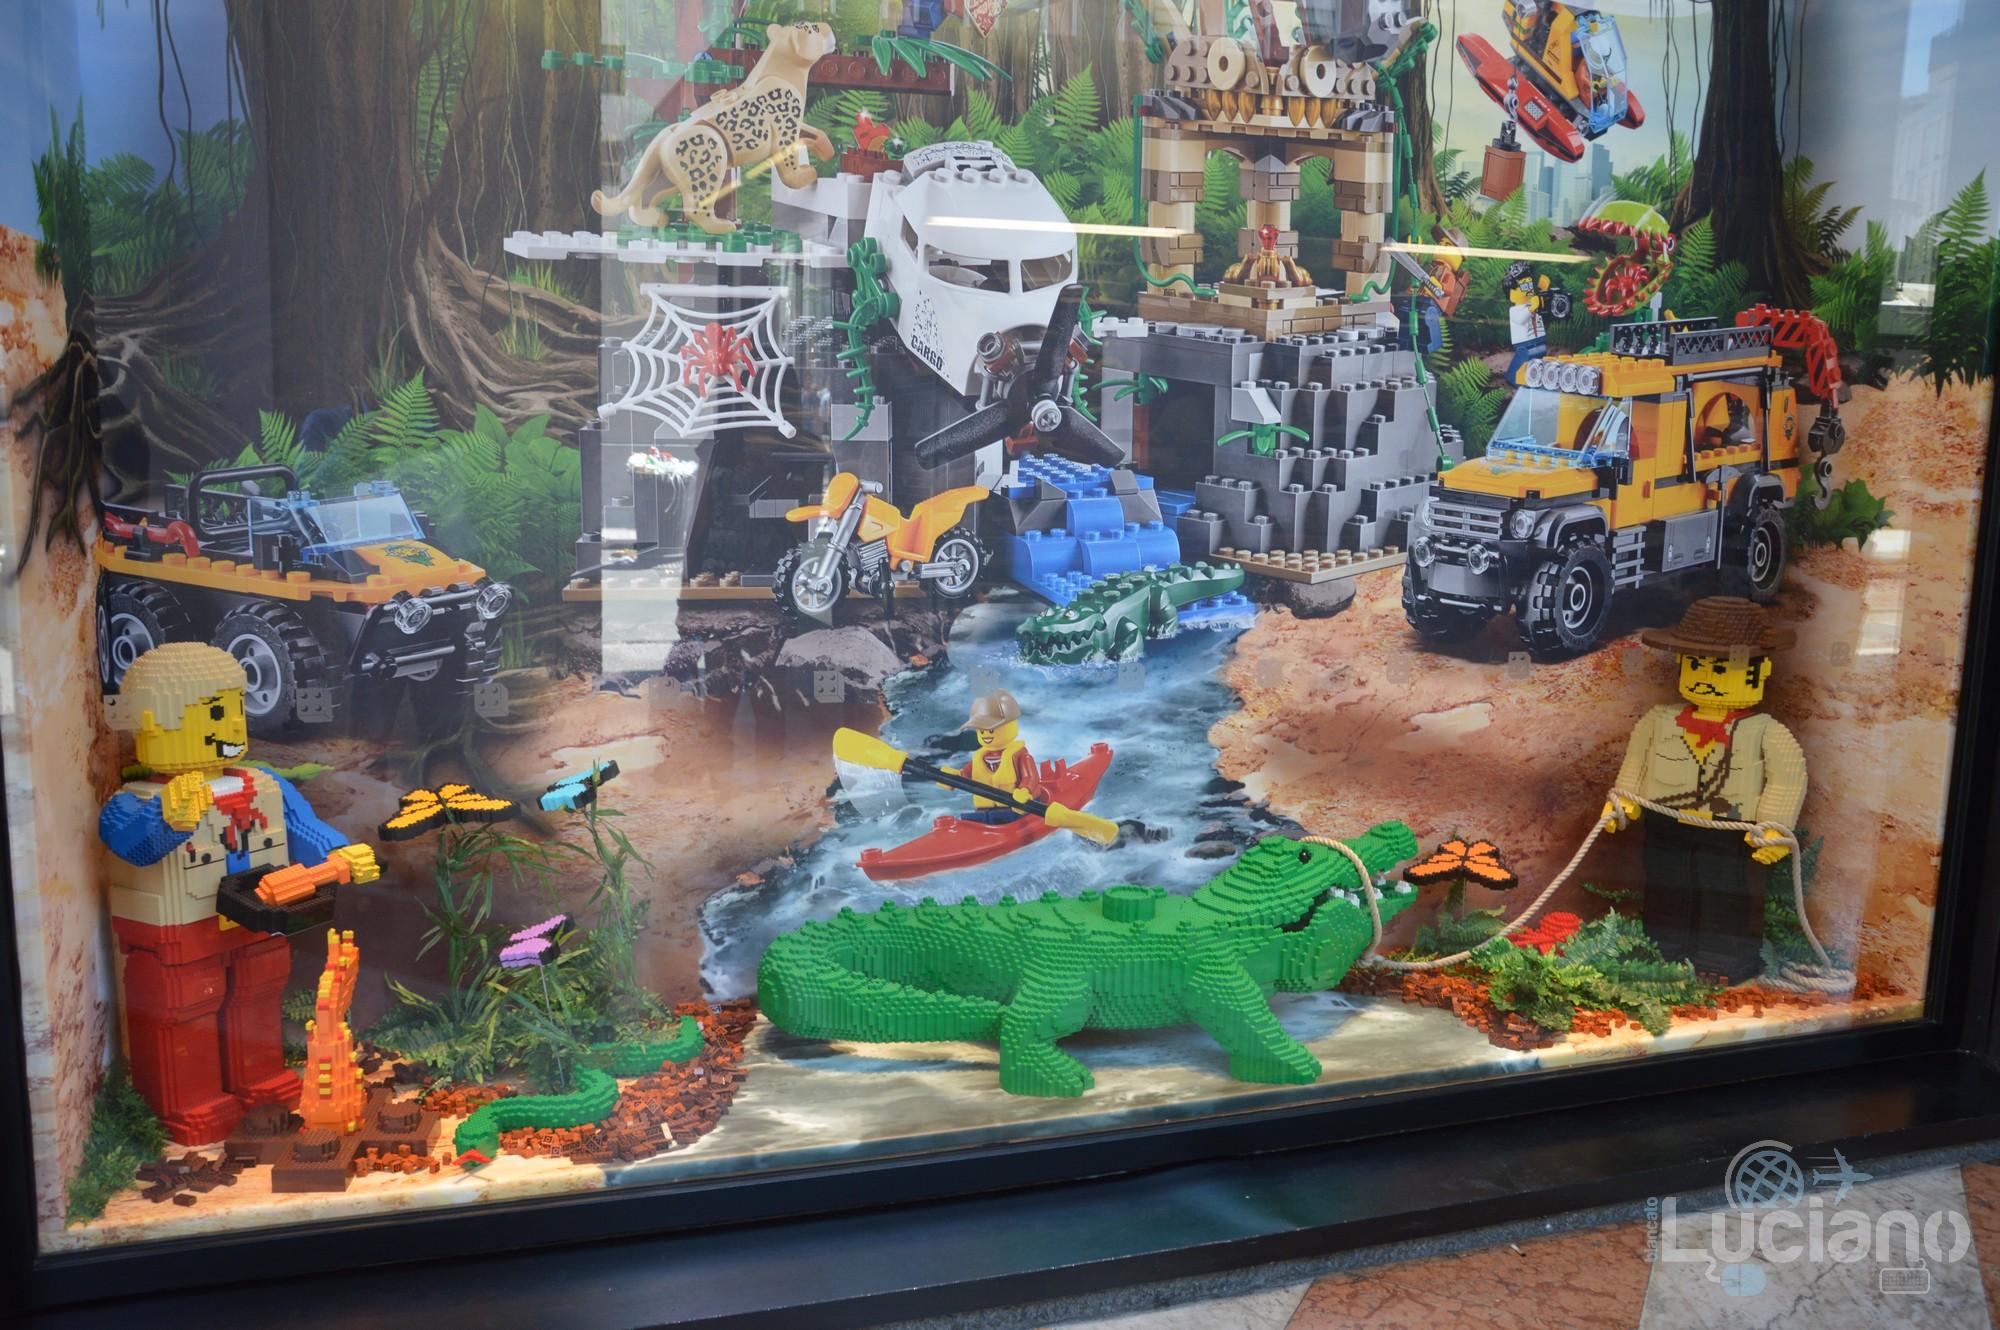 Lego Store - safari - Milano - Lombardia - Italia